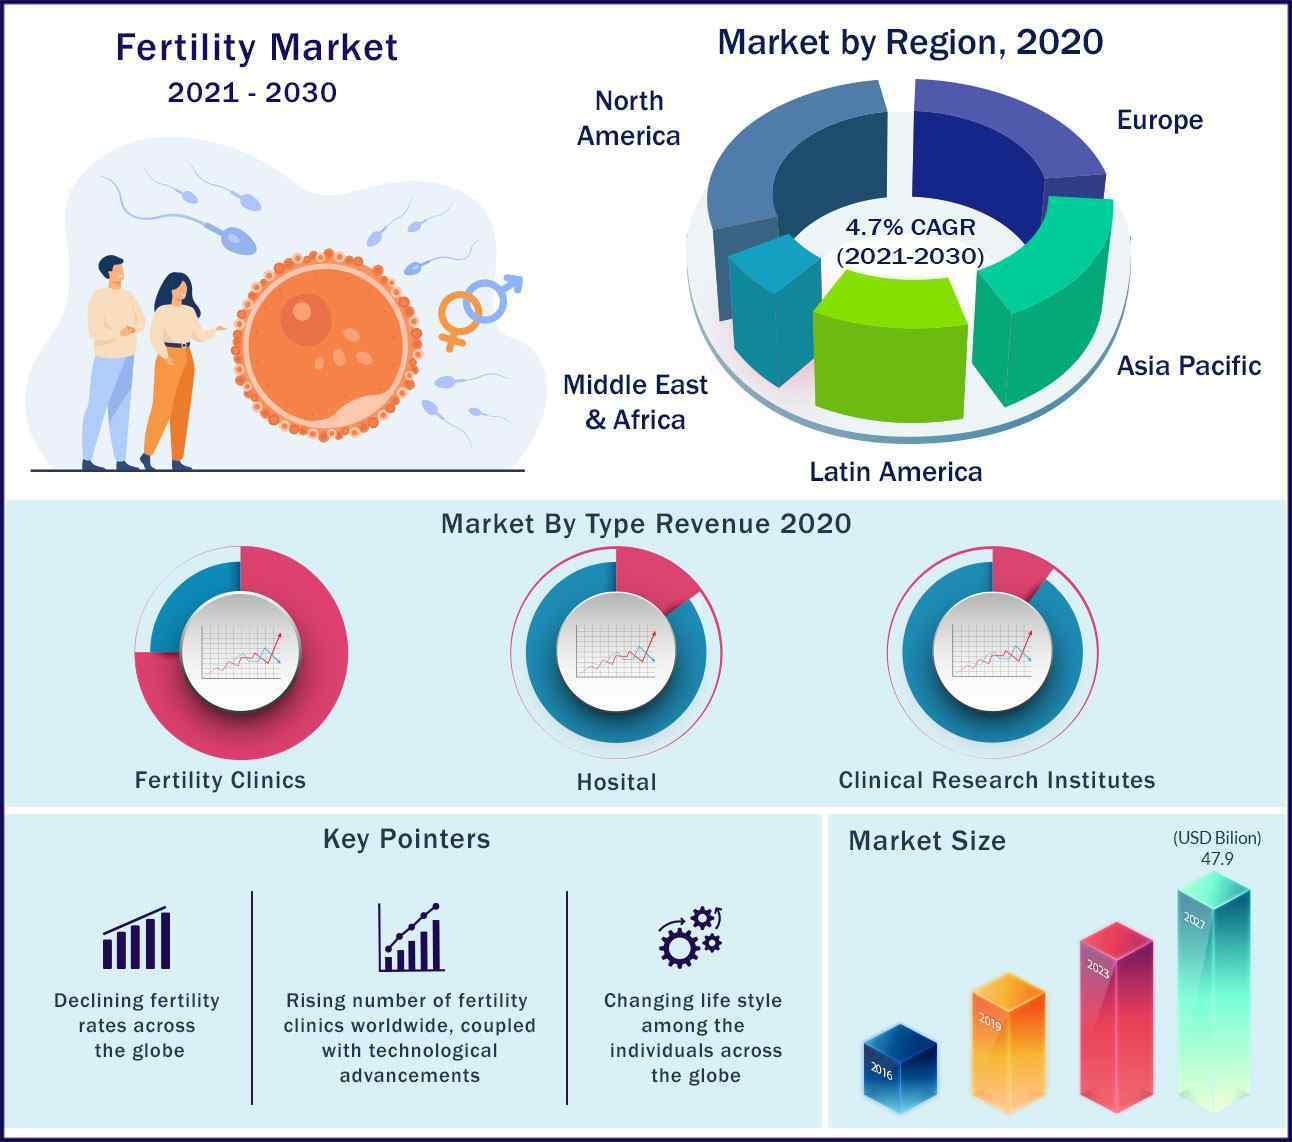 Global Fertility Market 2021 to 2030